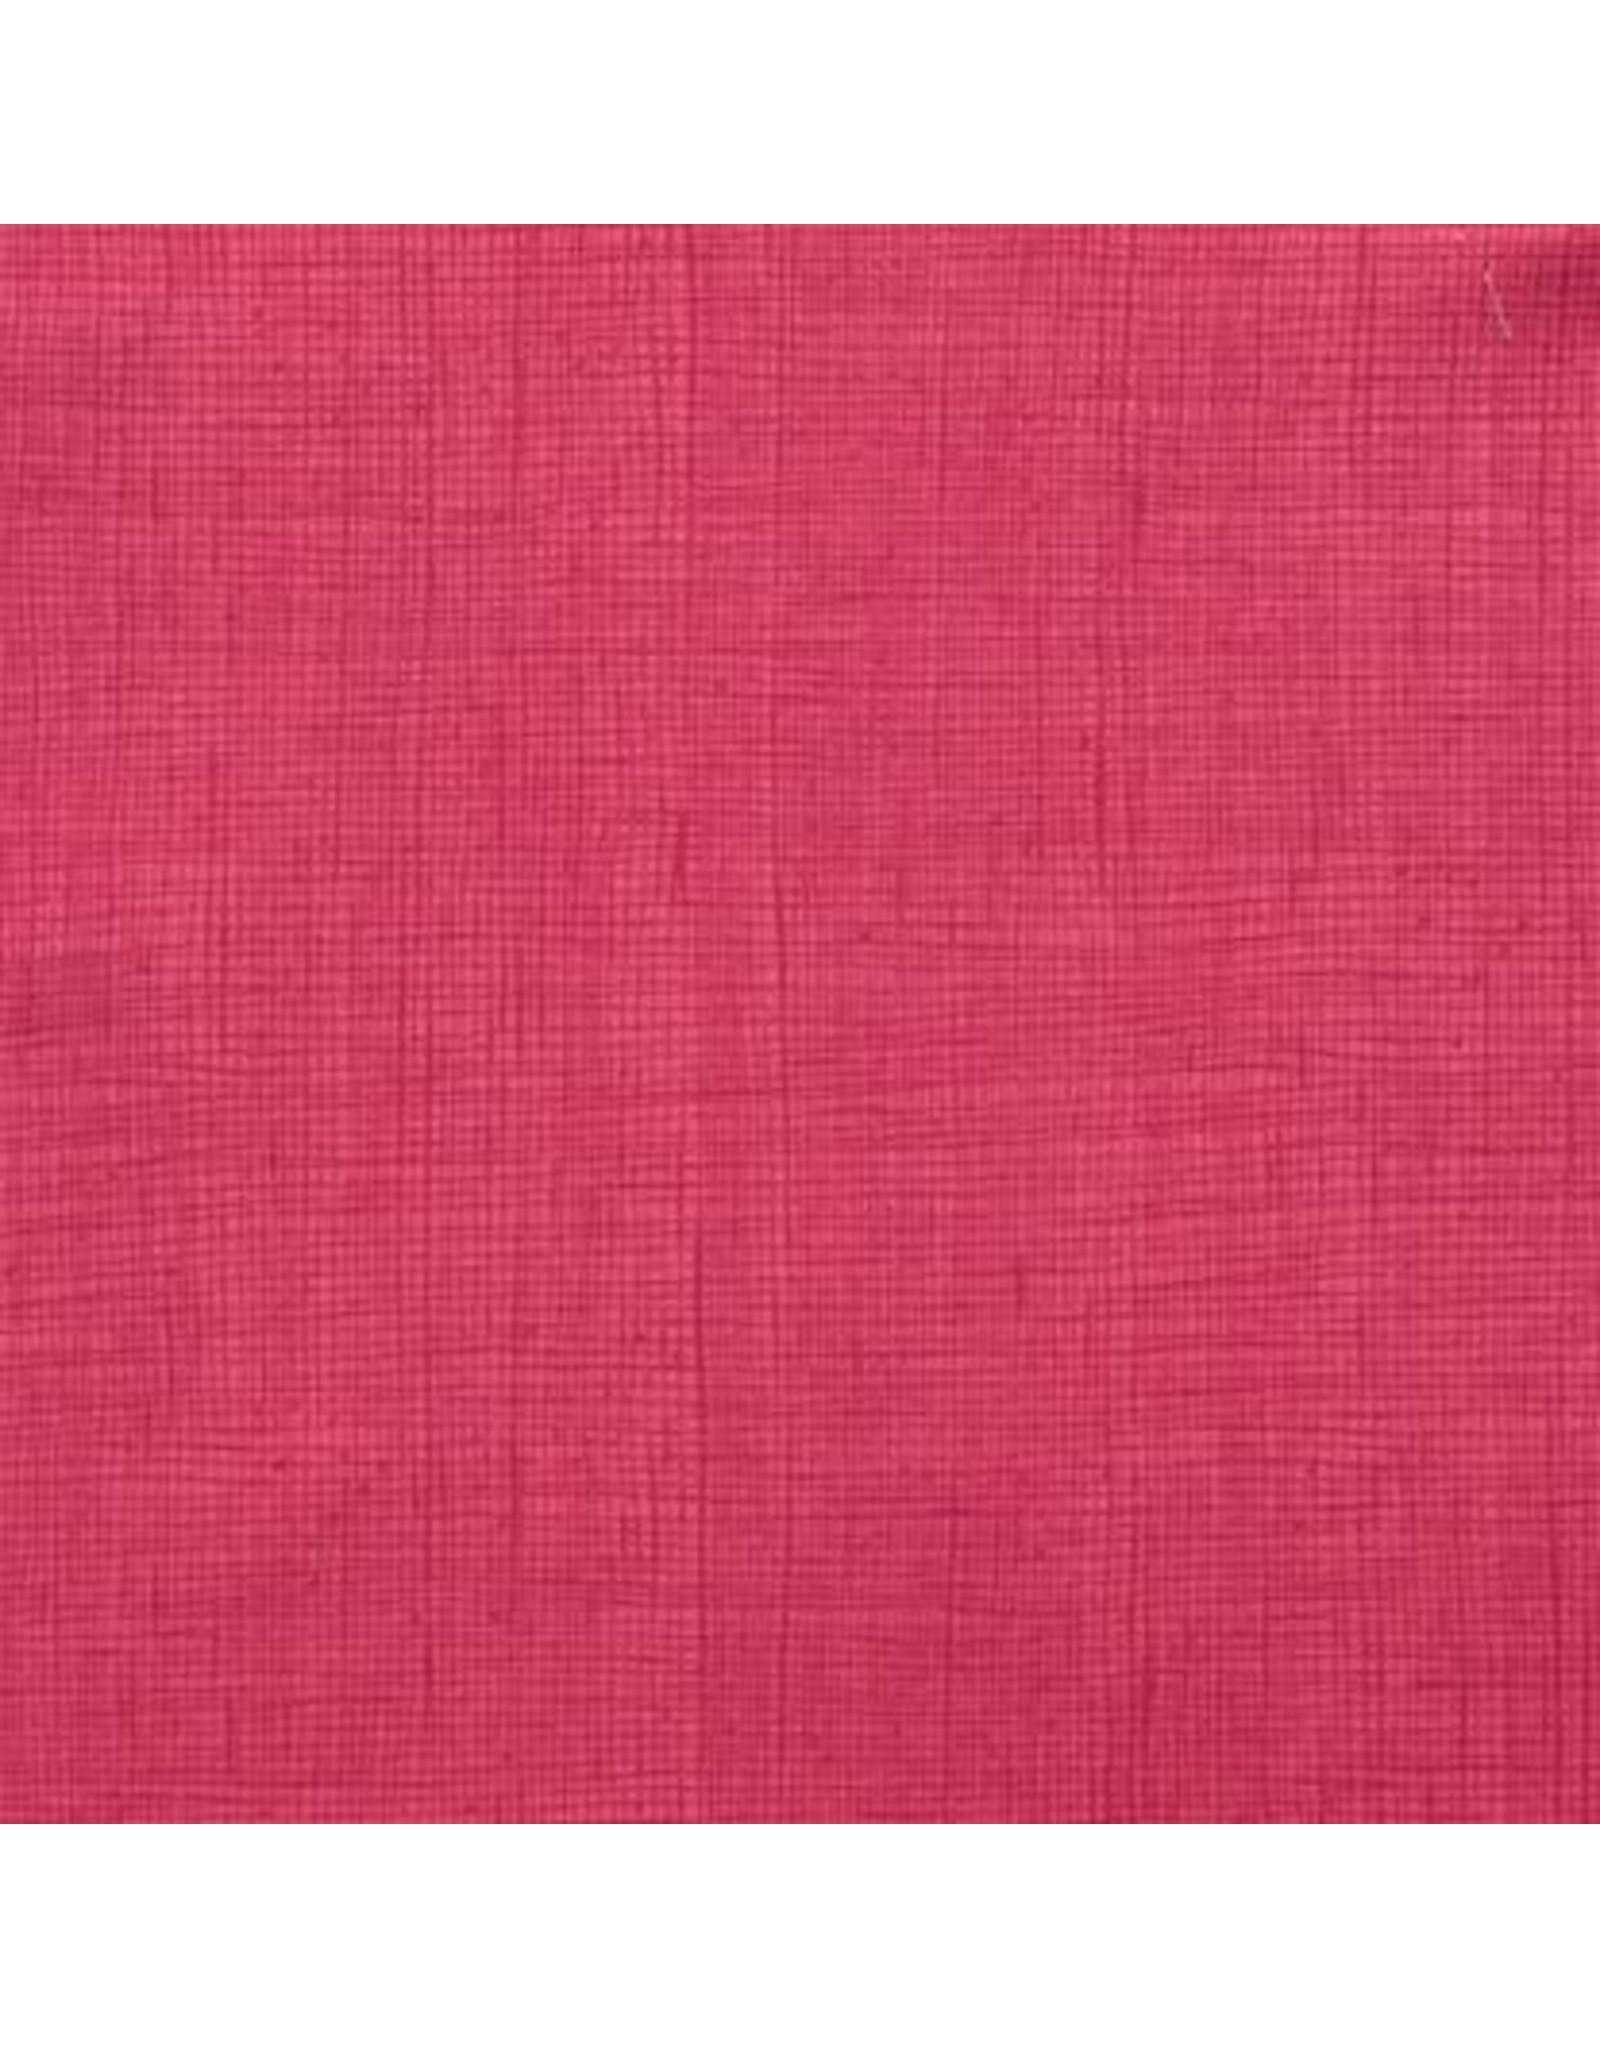 Alexander Henry Fabrics Heath in Rose Pink Fabric Half-Yards 6883 17